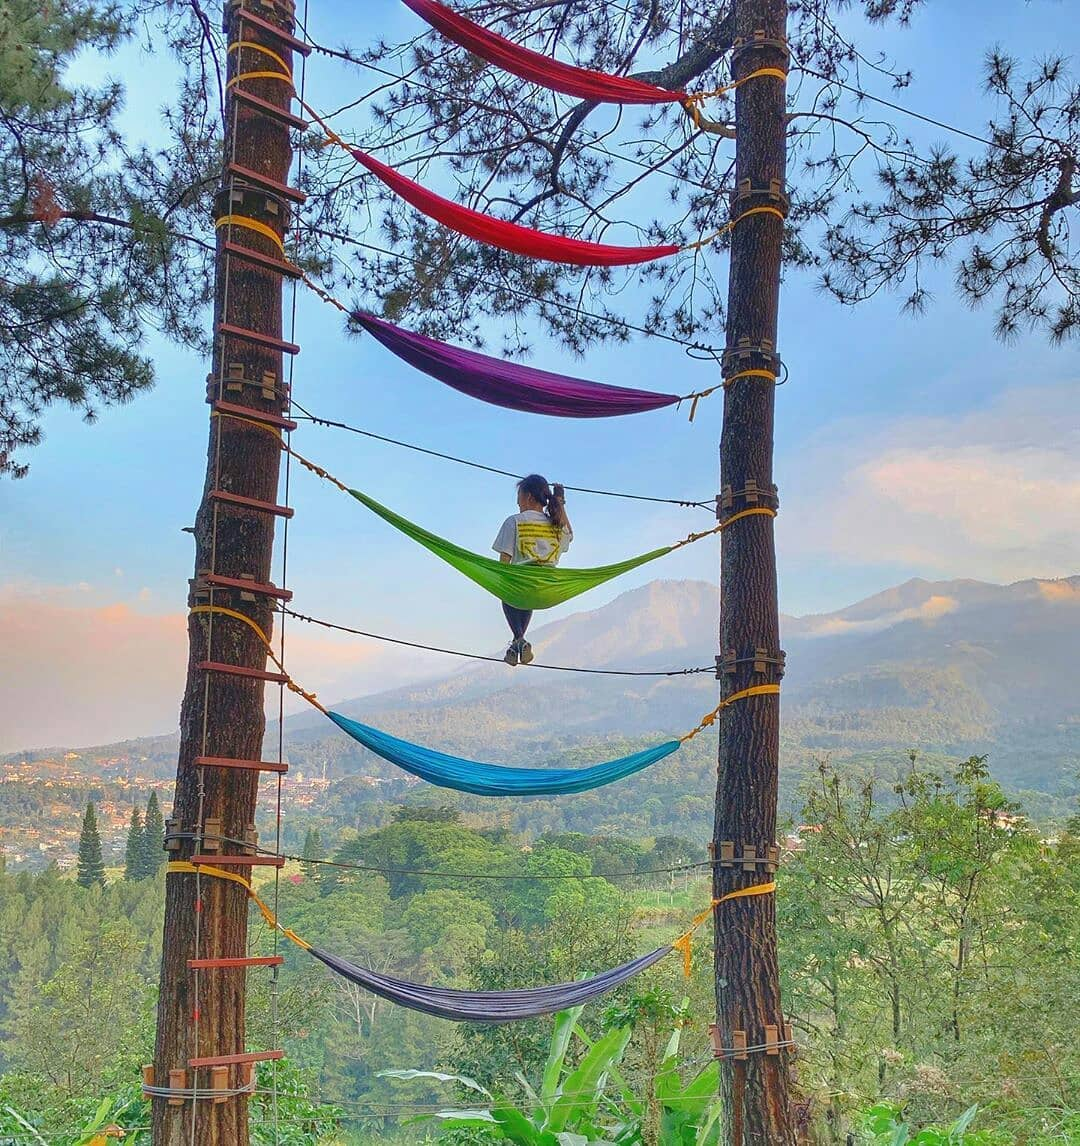 Harga Tiket Masuk Tretes Treetop Adventure Park Pasuruan - Wisatainfo